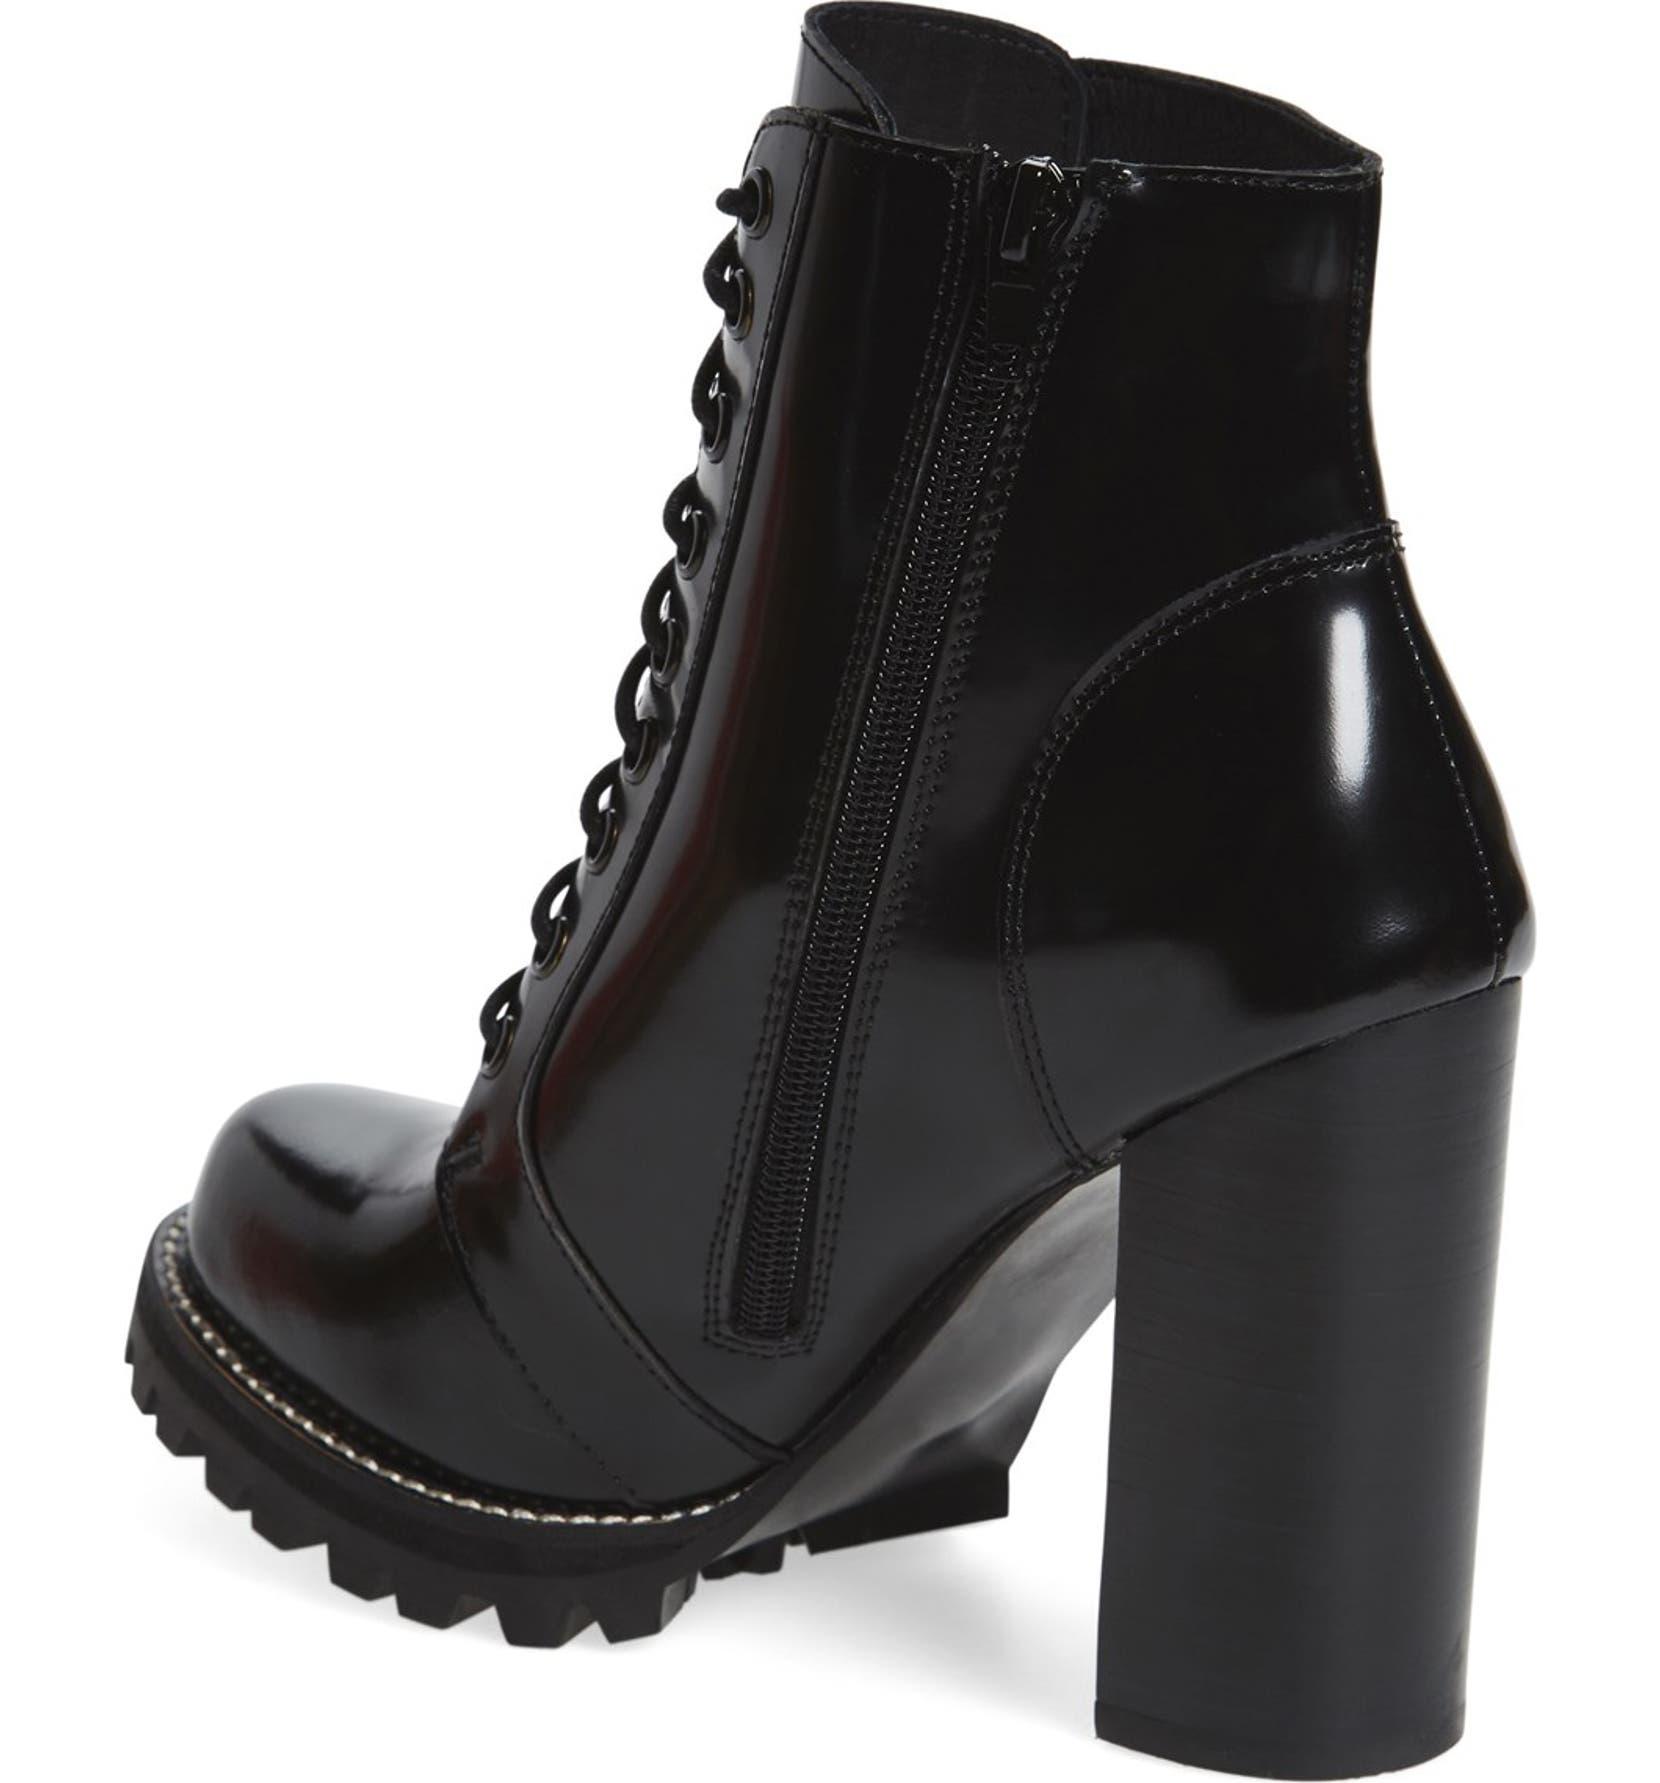 d1b807ca84f 'Legion' High Heel Boot